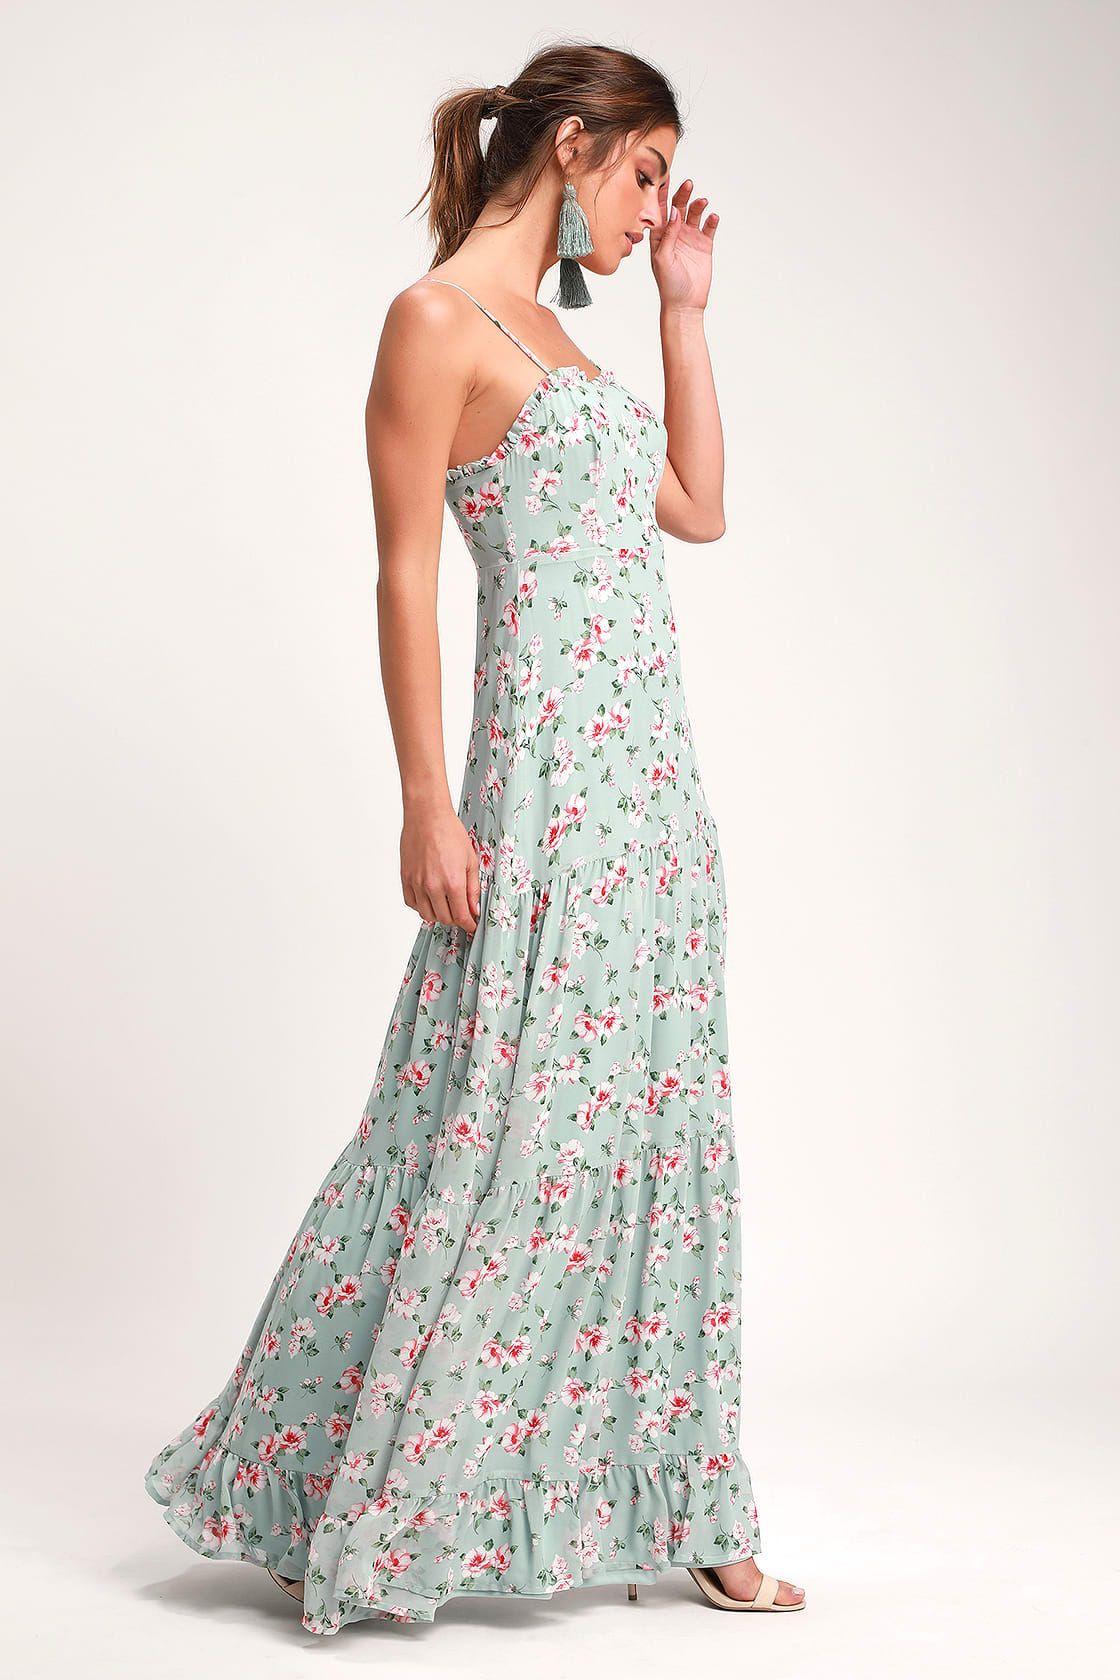 Melissa Light Sage Green Floral Print Tiered Maxi Dress #sagegreendress